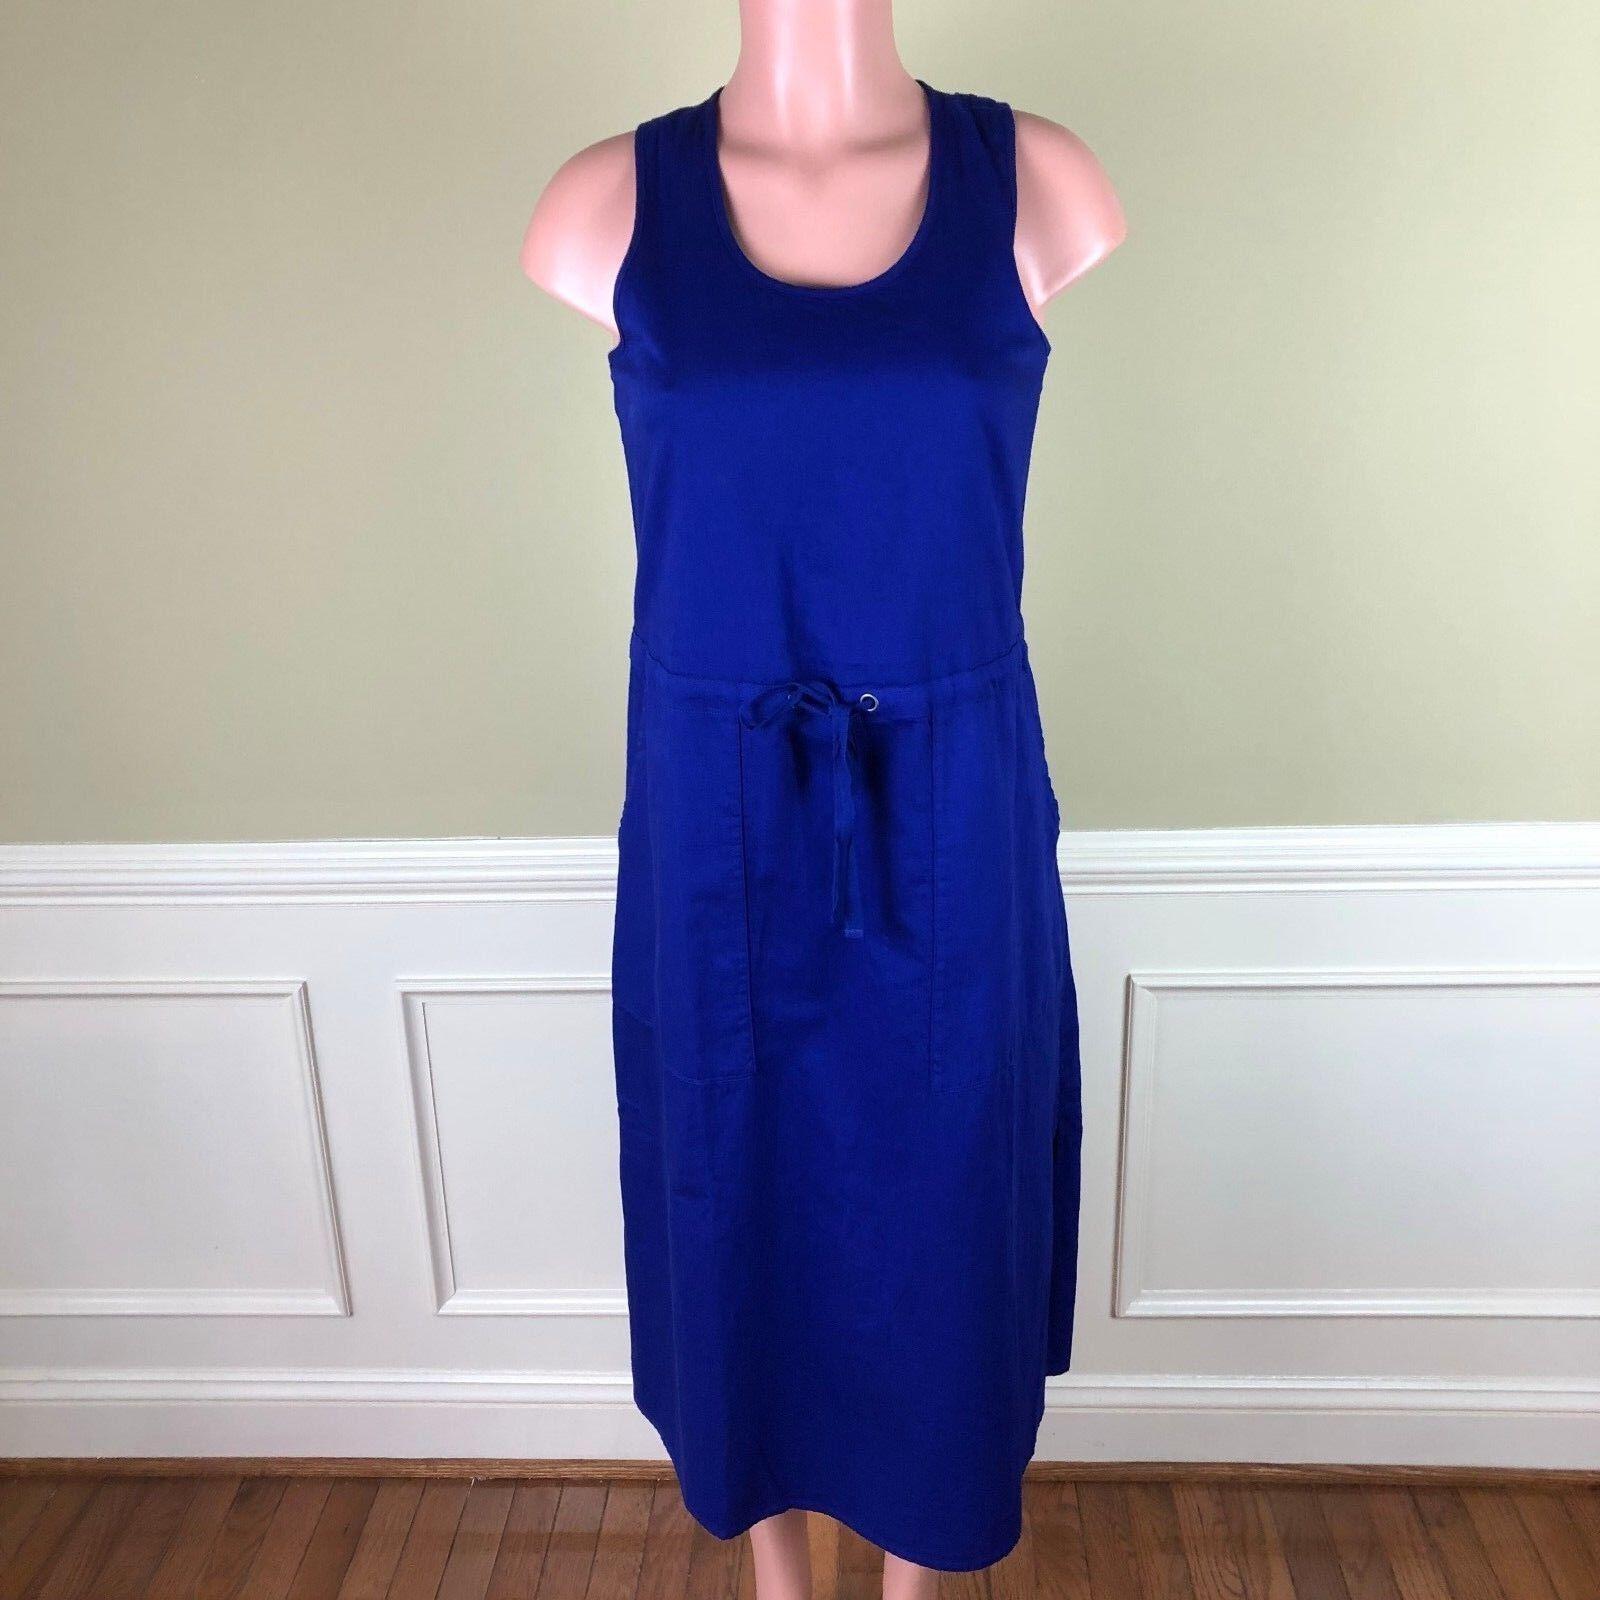 Eileen Fisher damen Dress Blau Sleeveless Twill Organic Cotton Größe PP NEW